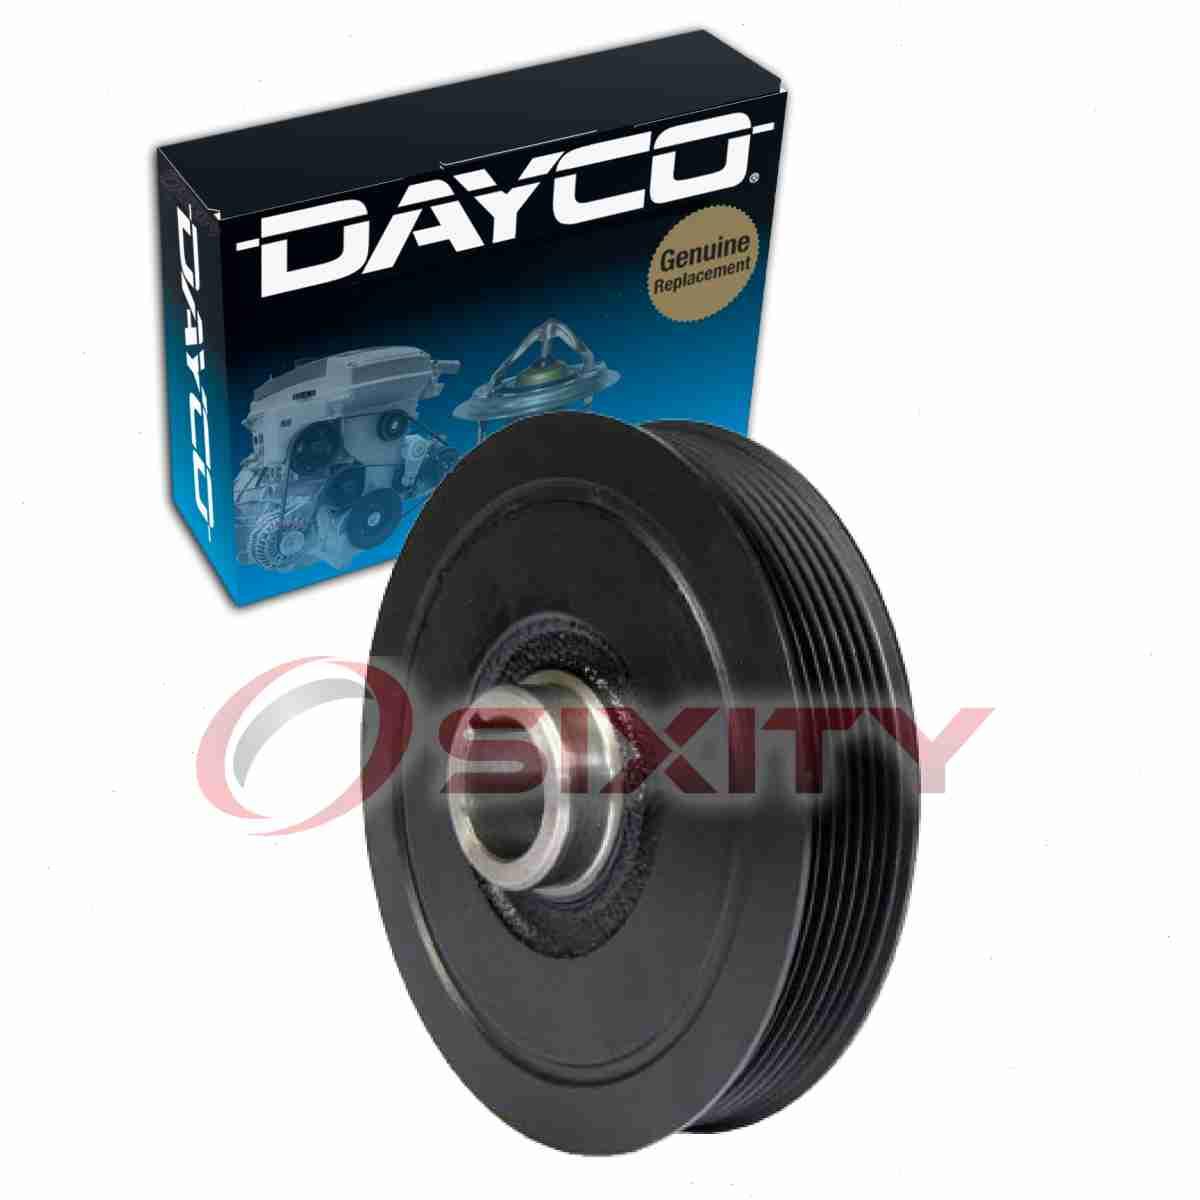 PREMIUM OEM REPL POWERBOND Dayco PB1050N Harmonic Balancer